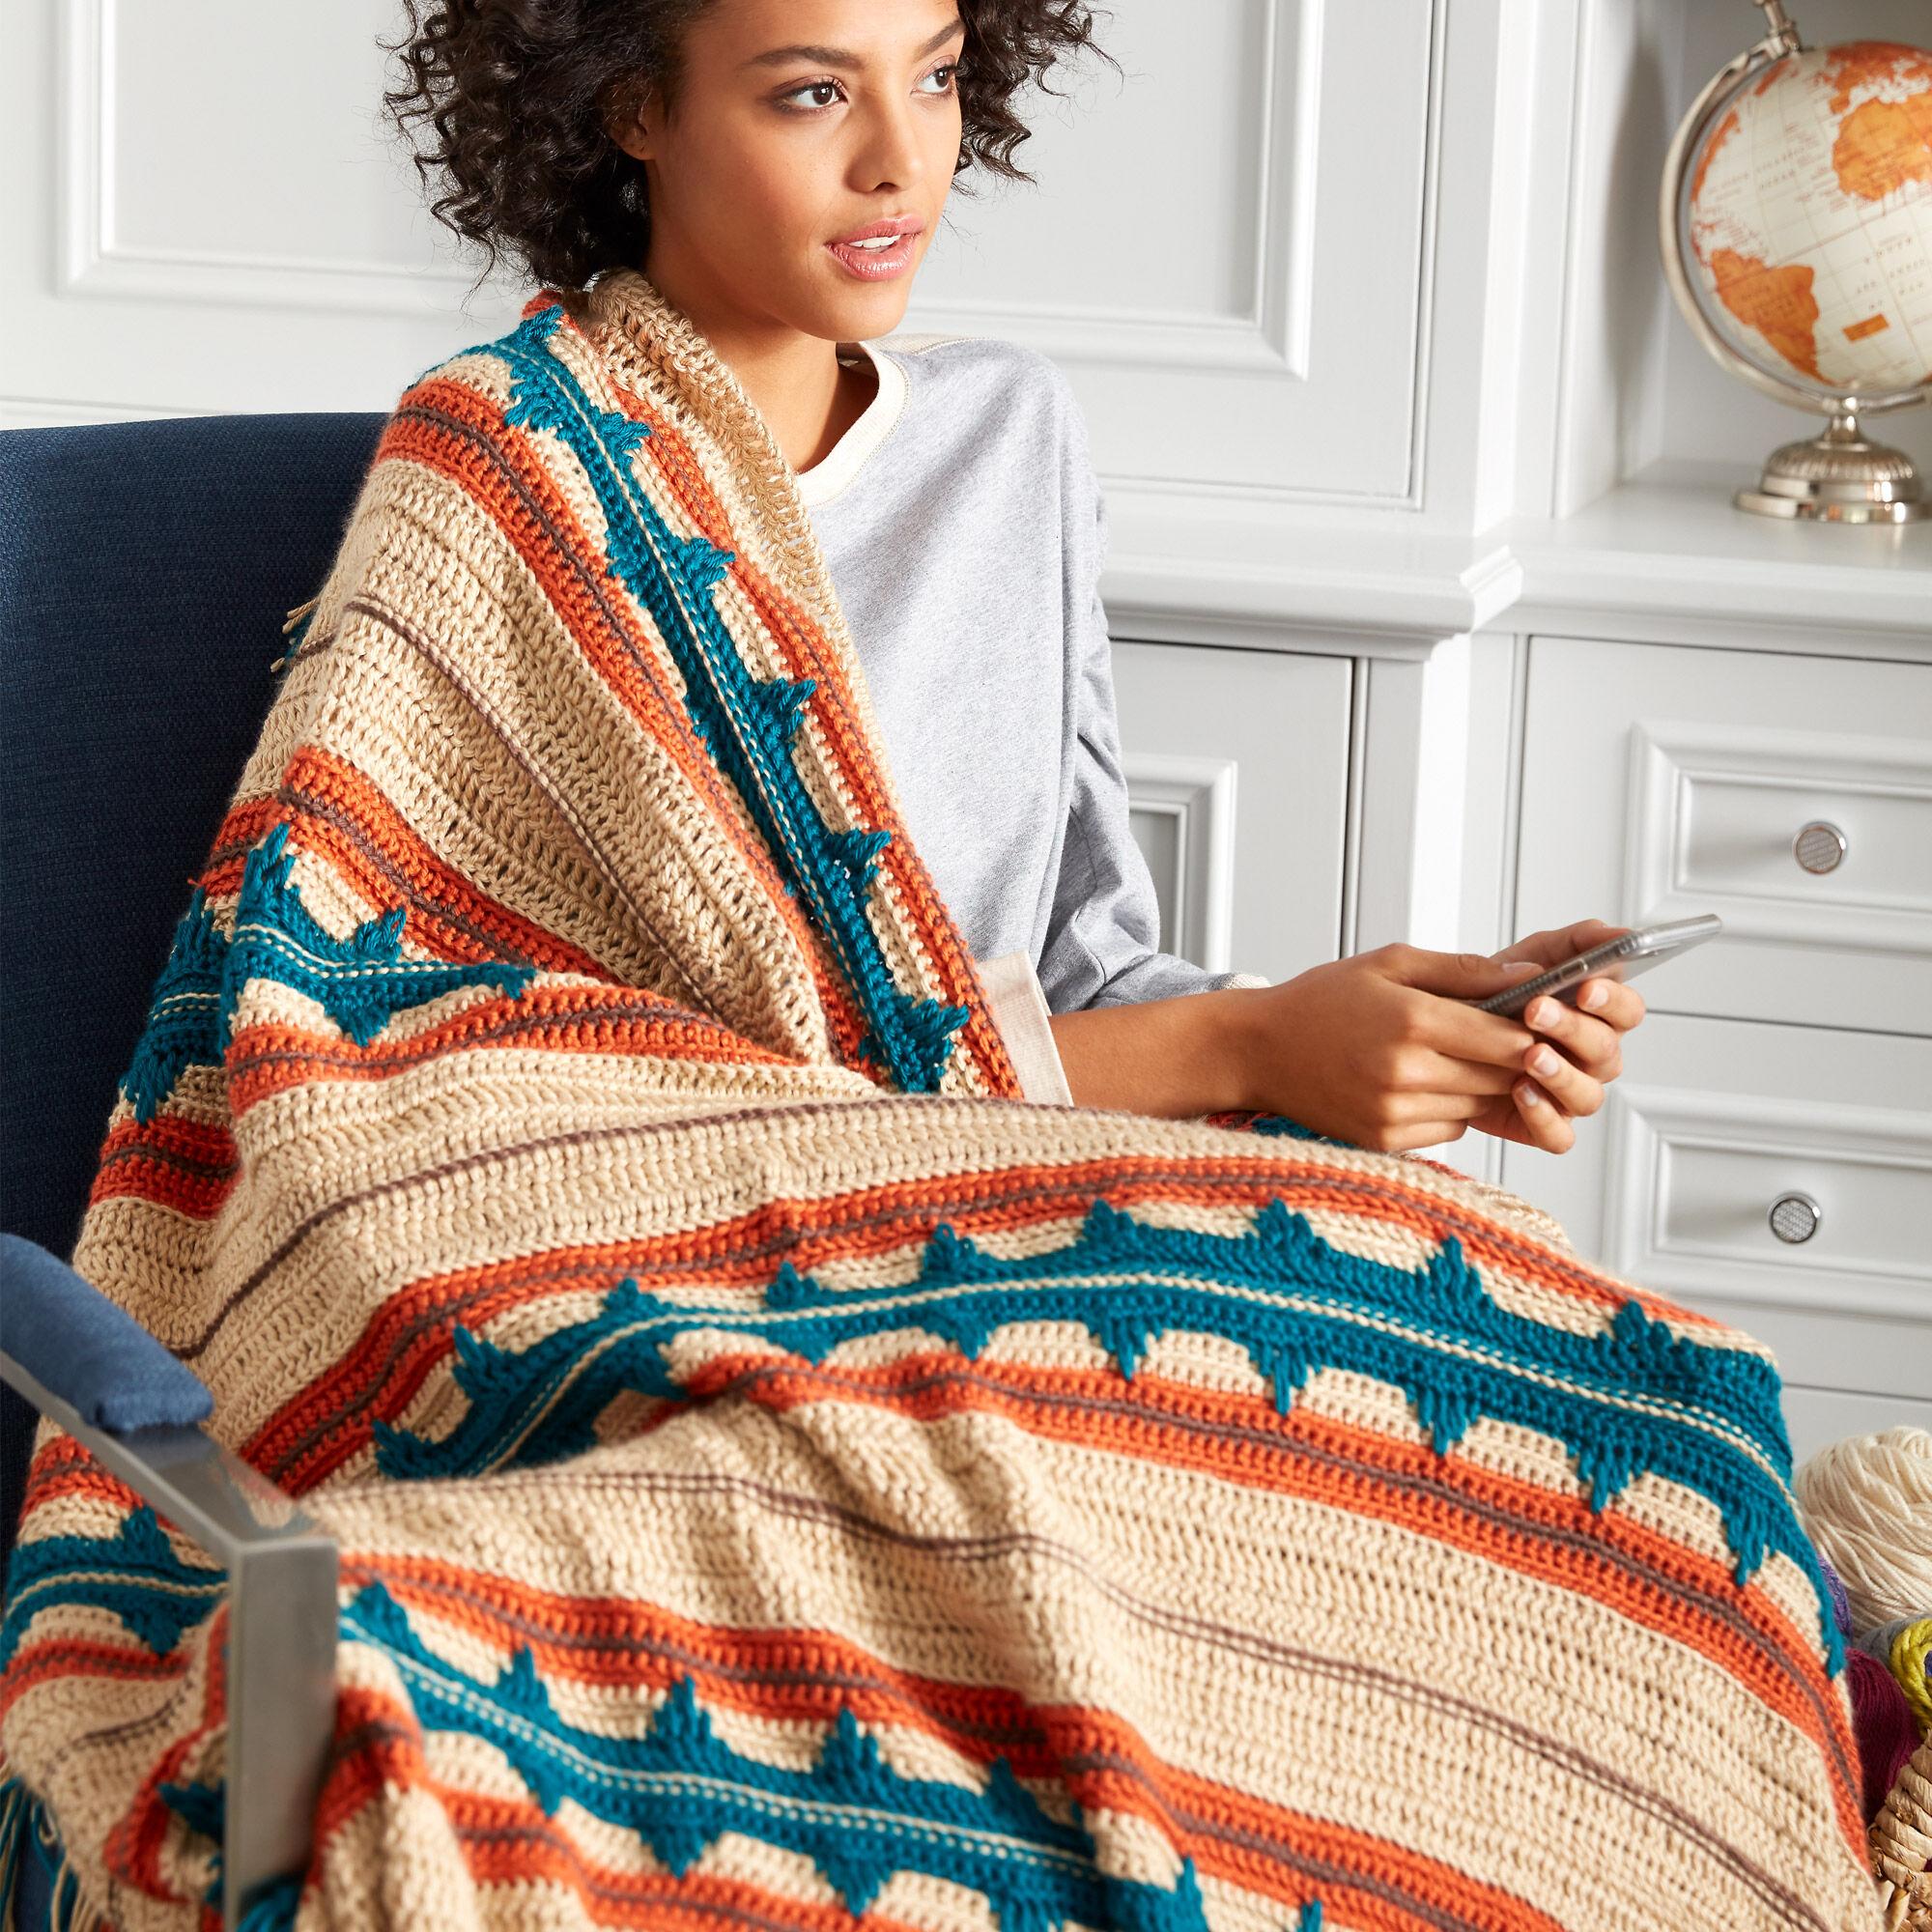 Caron Southwest Stripe Crochet Blanket Pattern | Yarnspirations